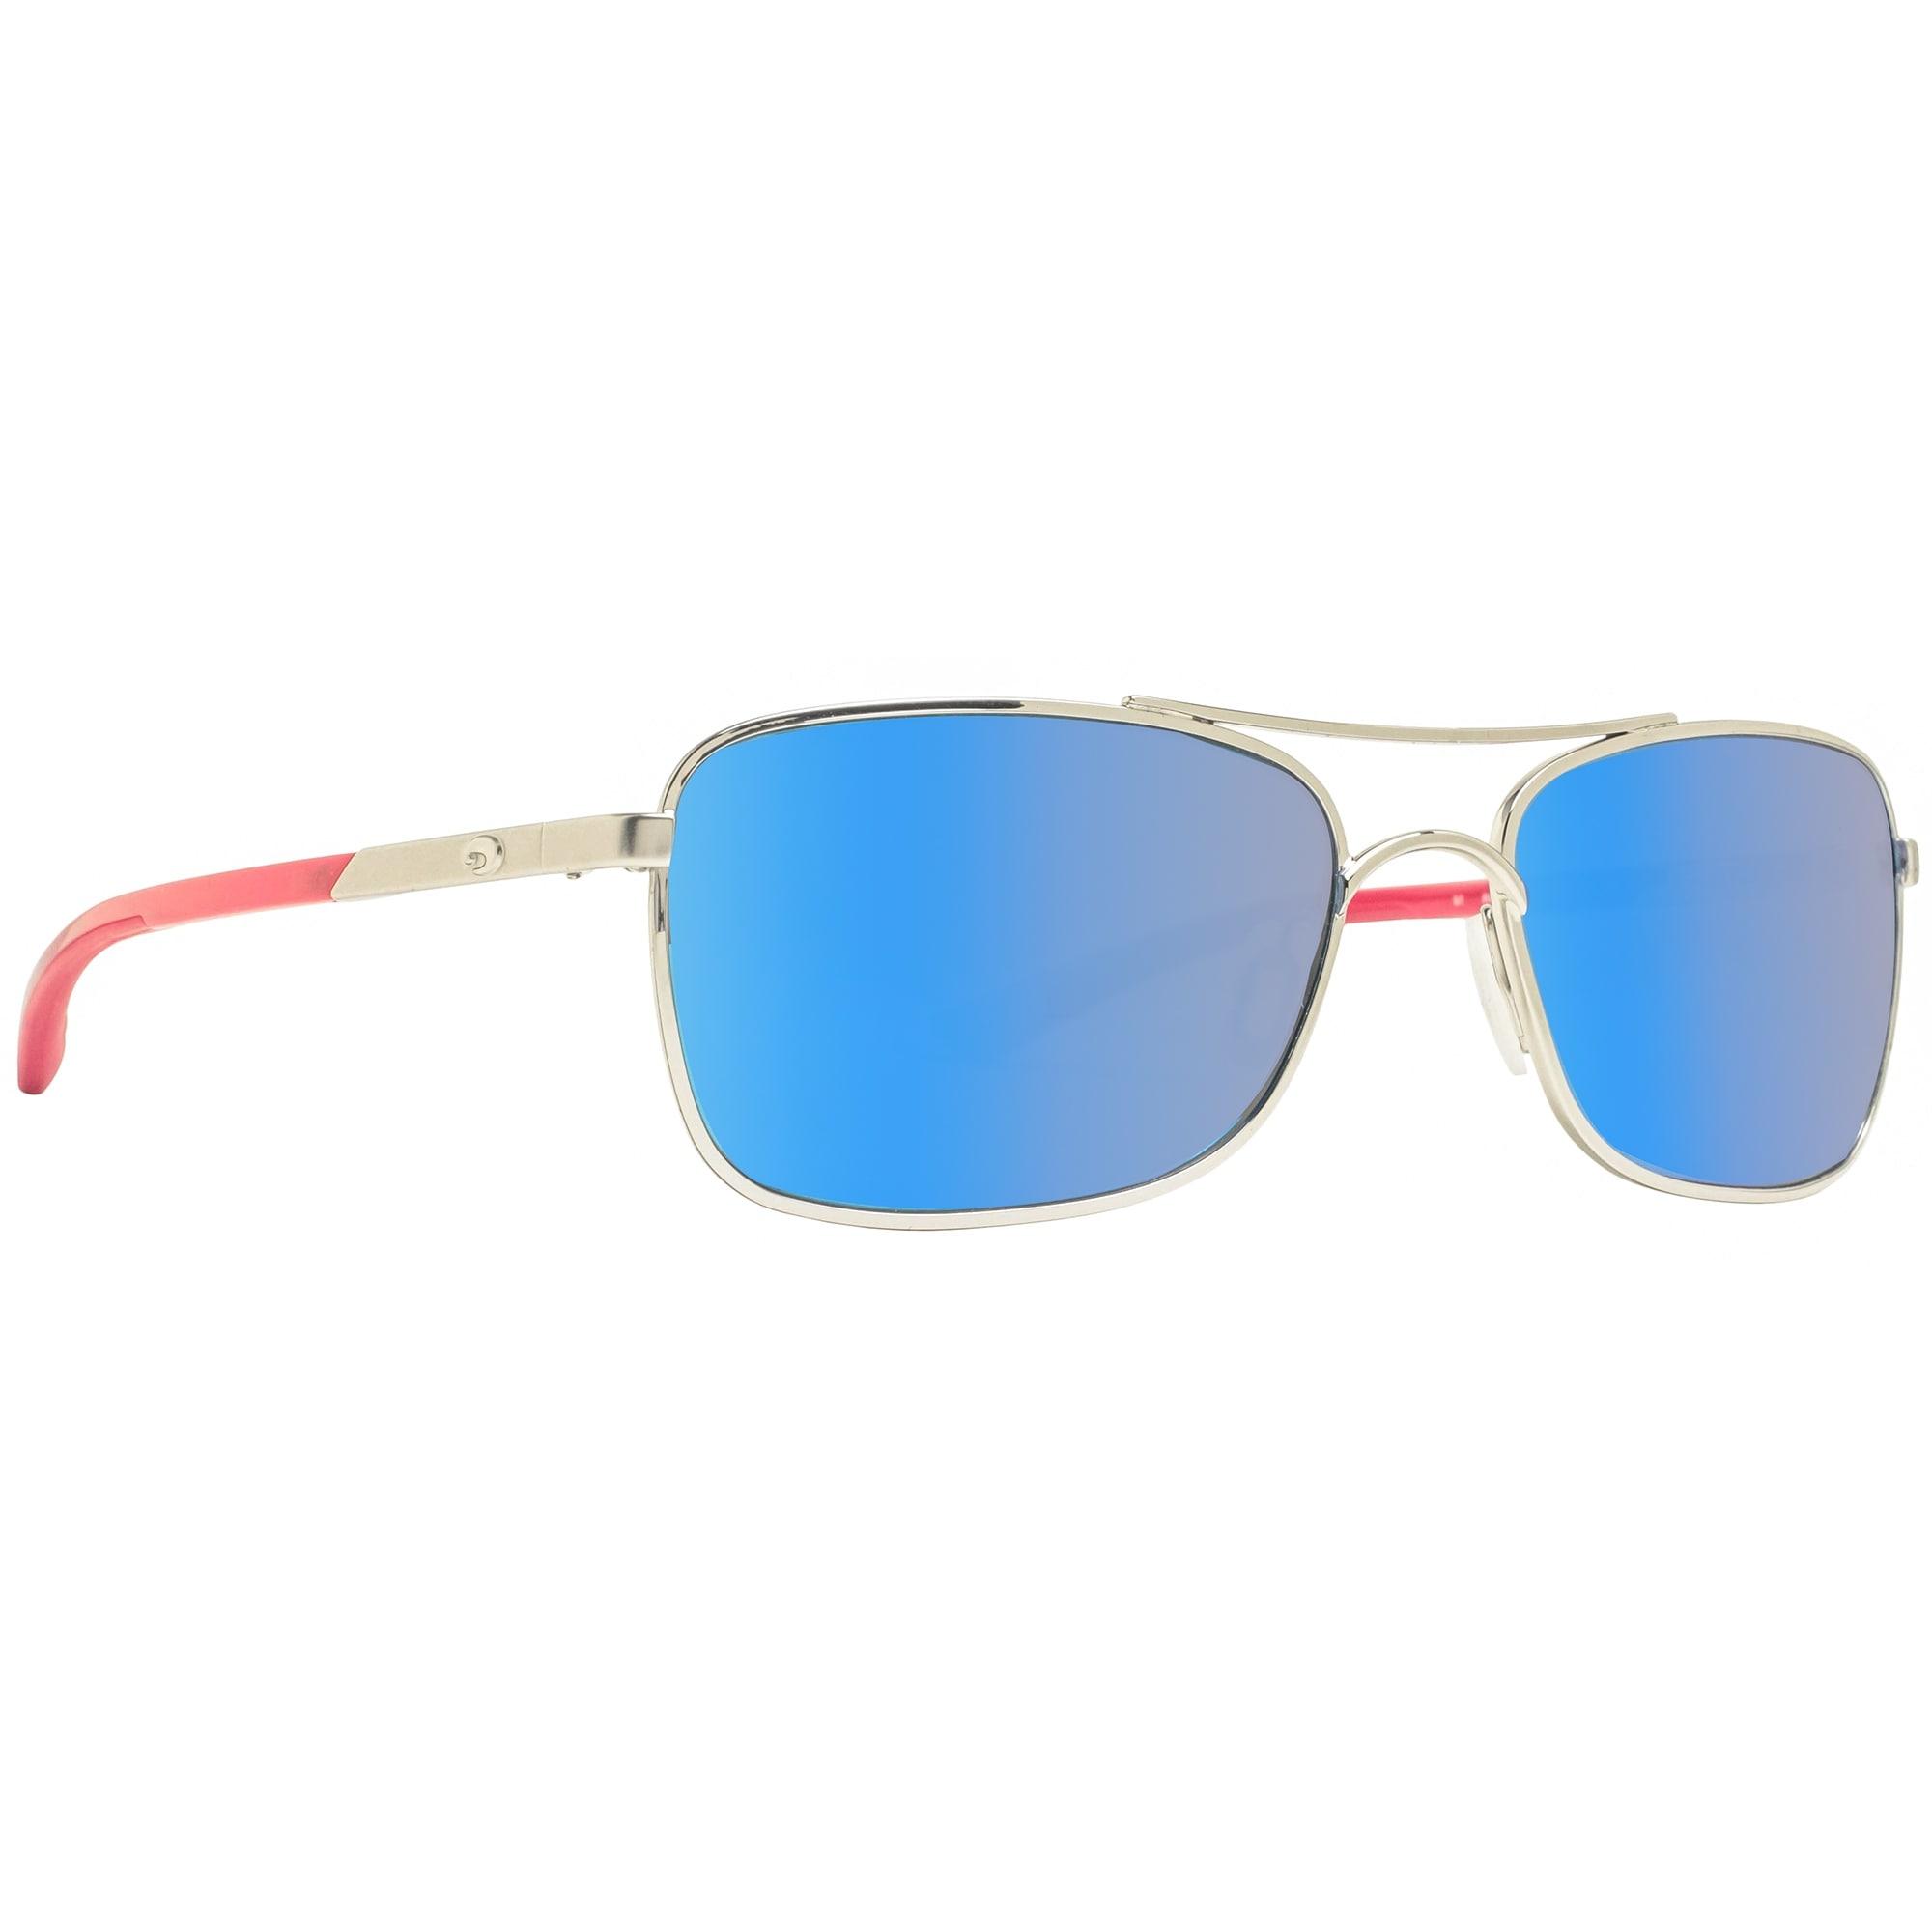 d2a635efbab Shop Costa Del Mar Palapa AP83 OBMGLP Palladium Blue Mirror Polarized 580G  Sunglasses - palladium red - 57mm-18mm-130mm - Free Shipping Today -  Overstock - ...